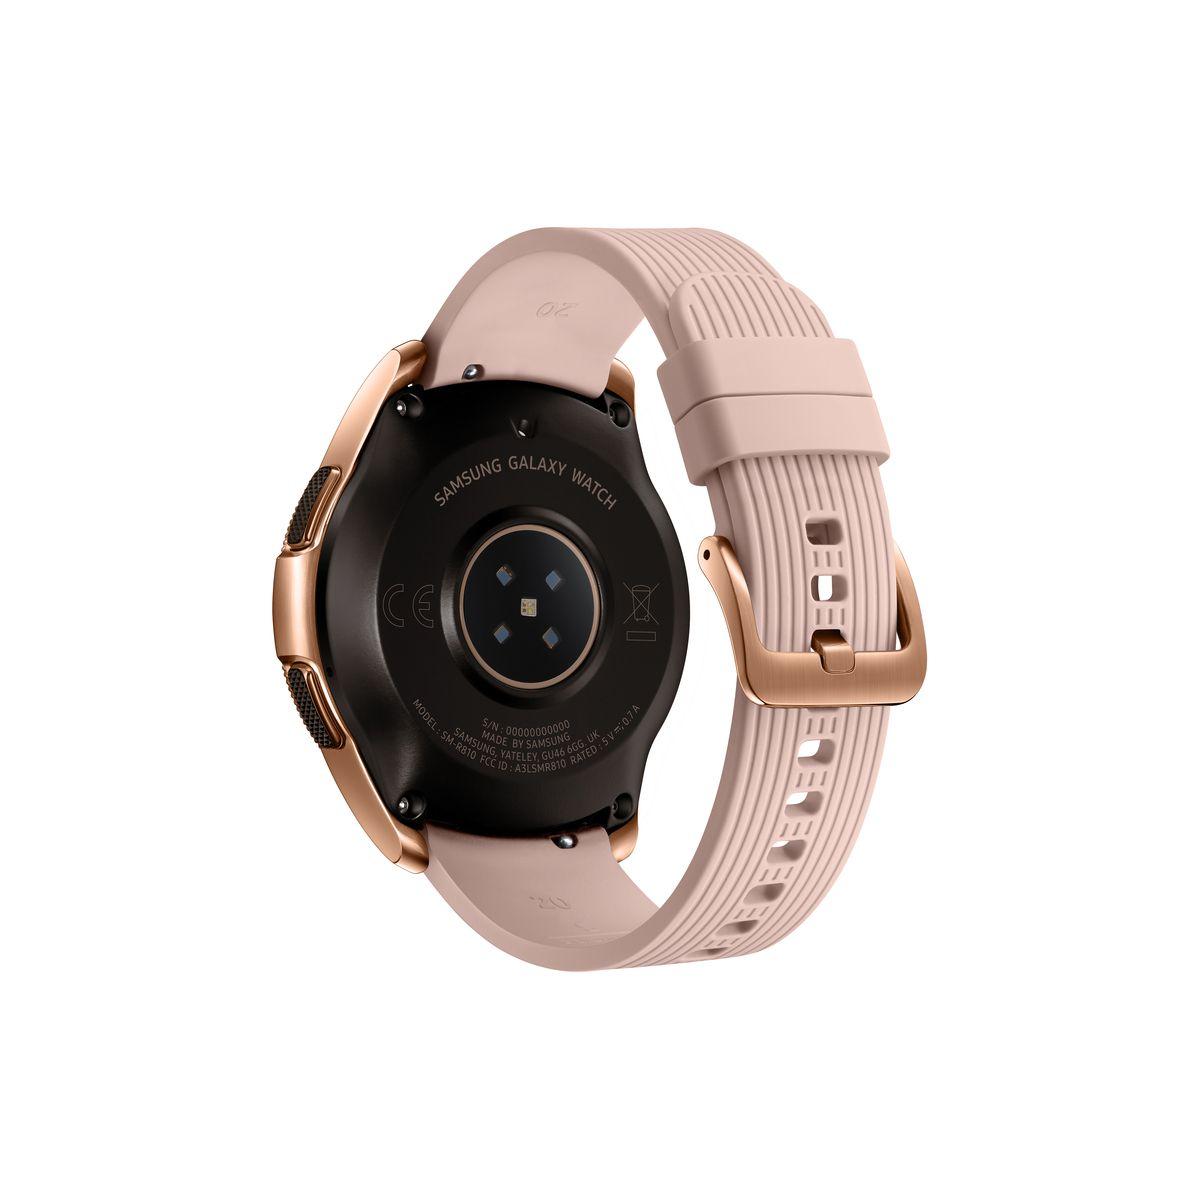 SAMSUNG Montre connectée - Galaxy watch - Or impérial - cadran 42 mm